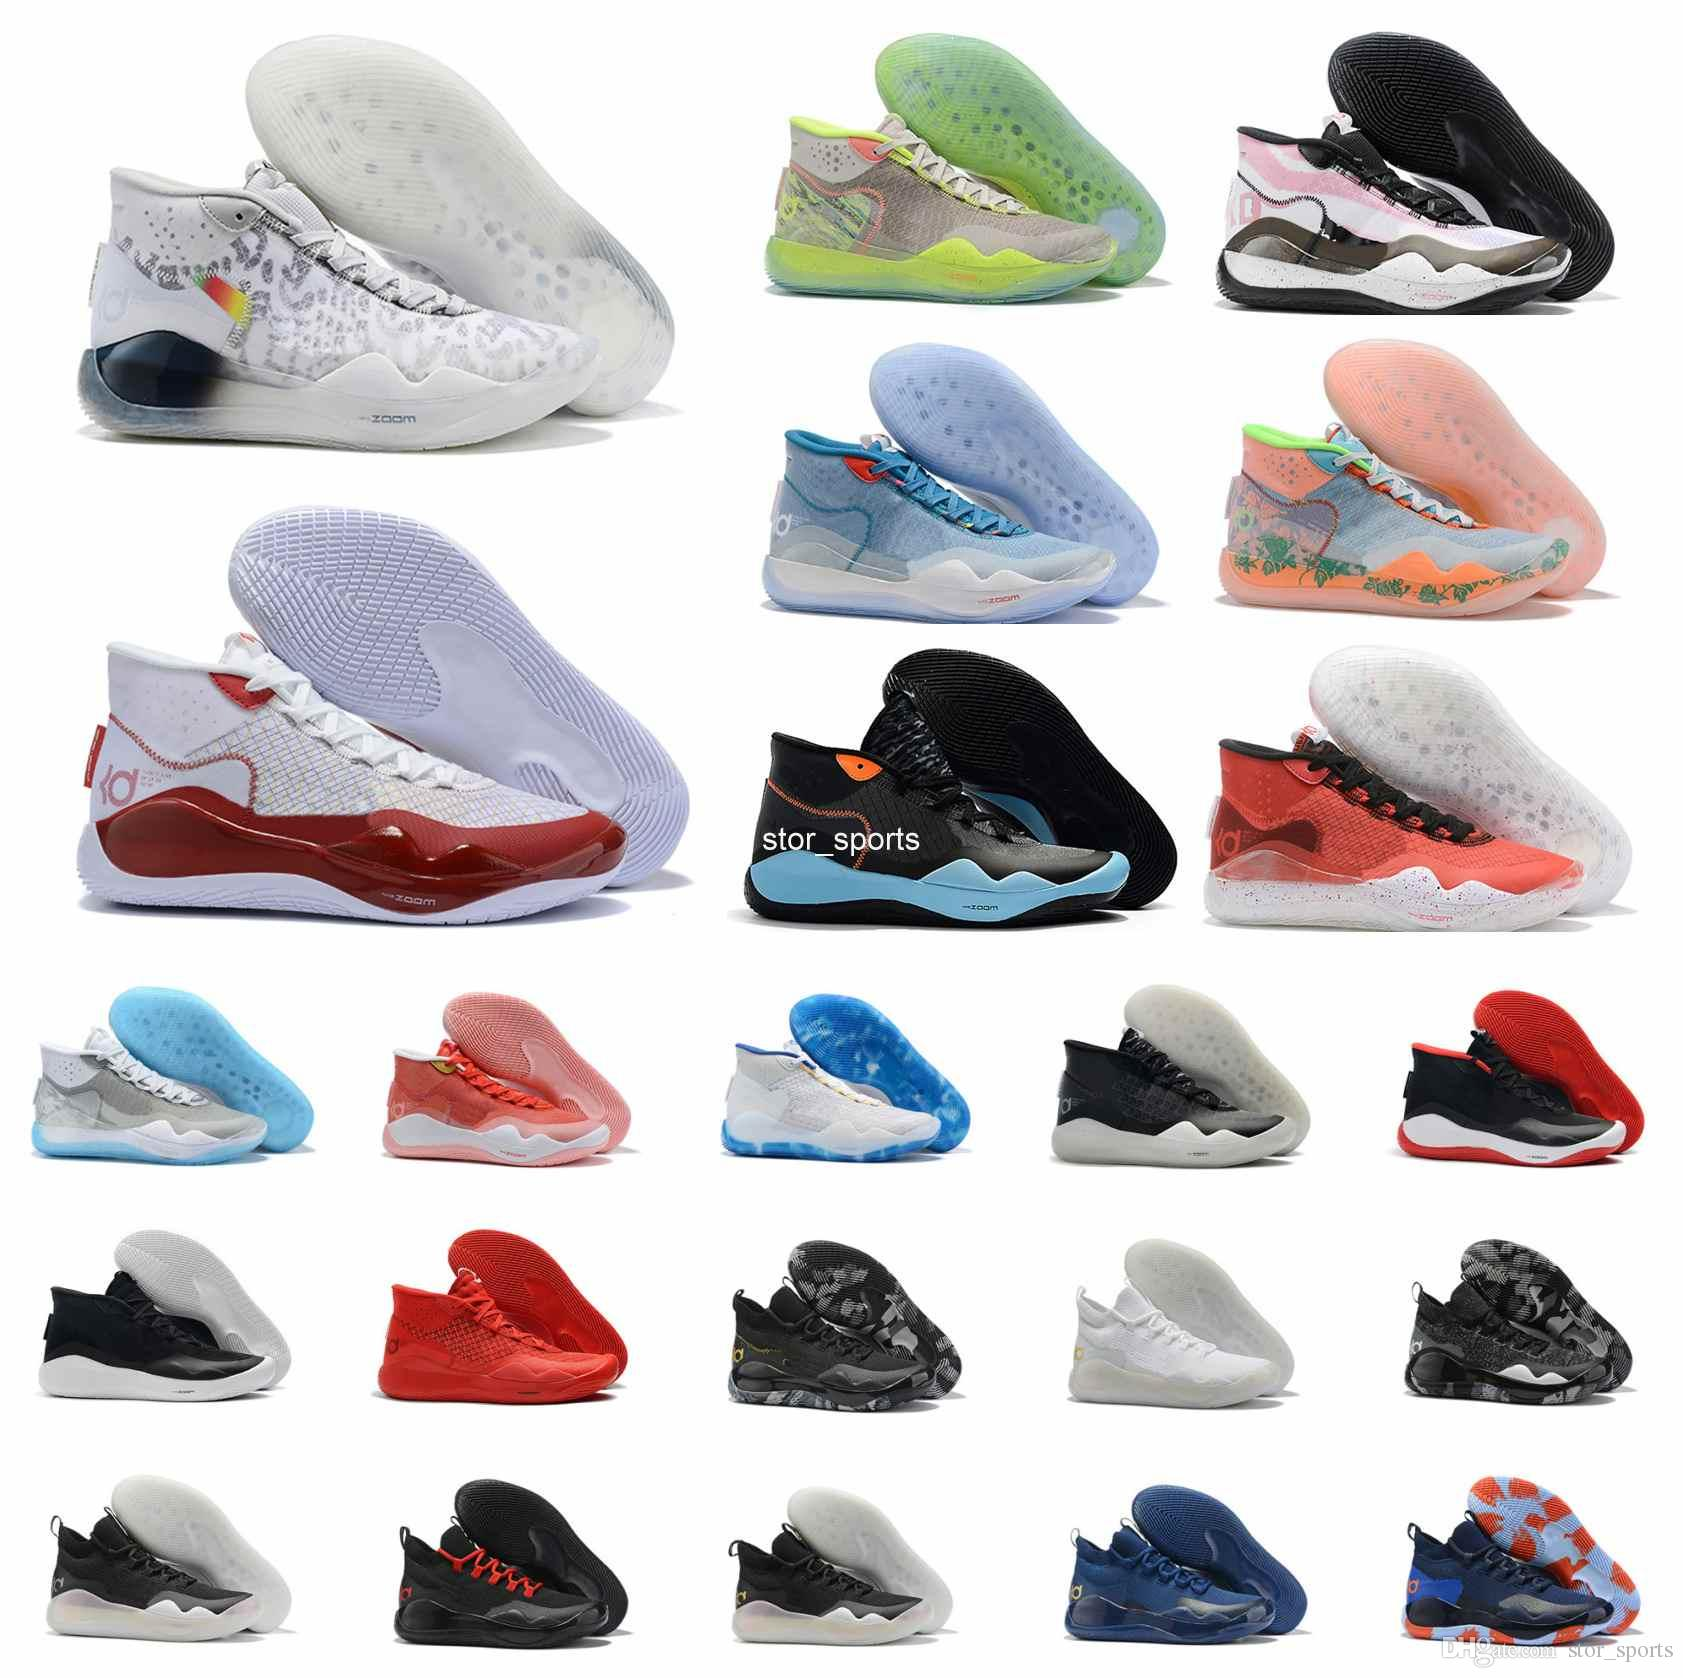 2019 Chaude MVP Kevin Durant KD 12 Anniversaire Universitaire 12 S XII Oreo Hommes Chaussures De Basketball USA Elite KD12 Sport Baskets Taille 40-46